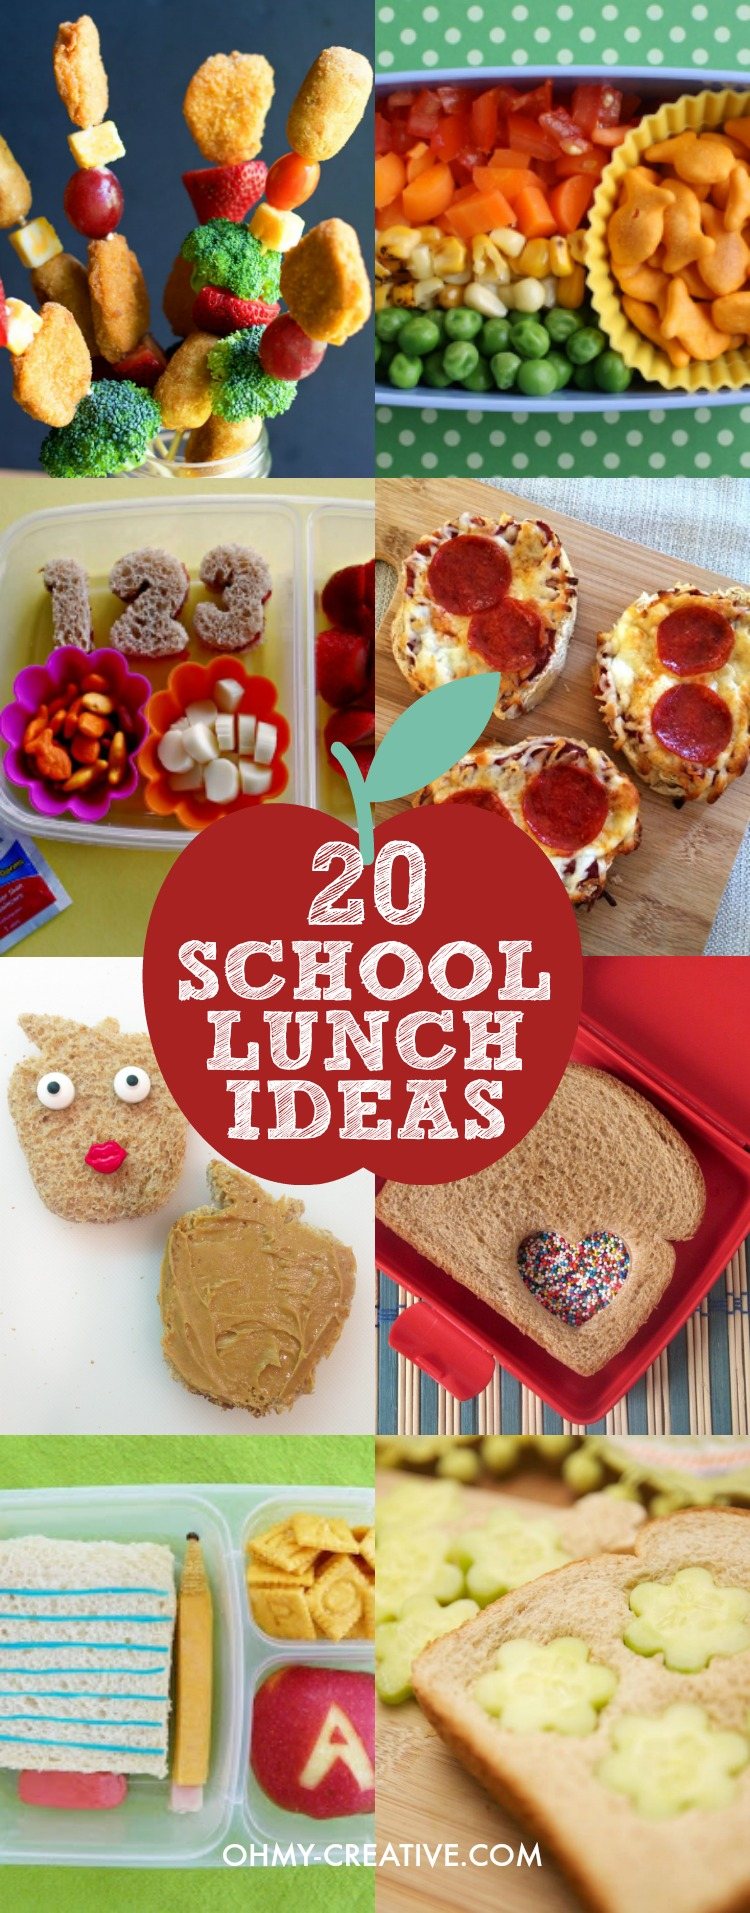 20 Creative School Lunch Ideas for Kids